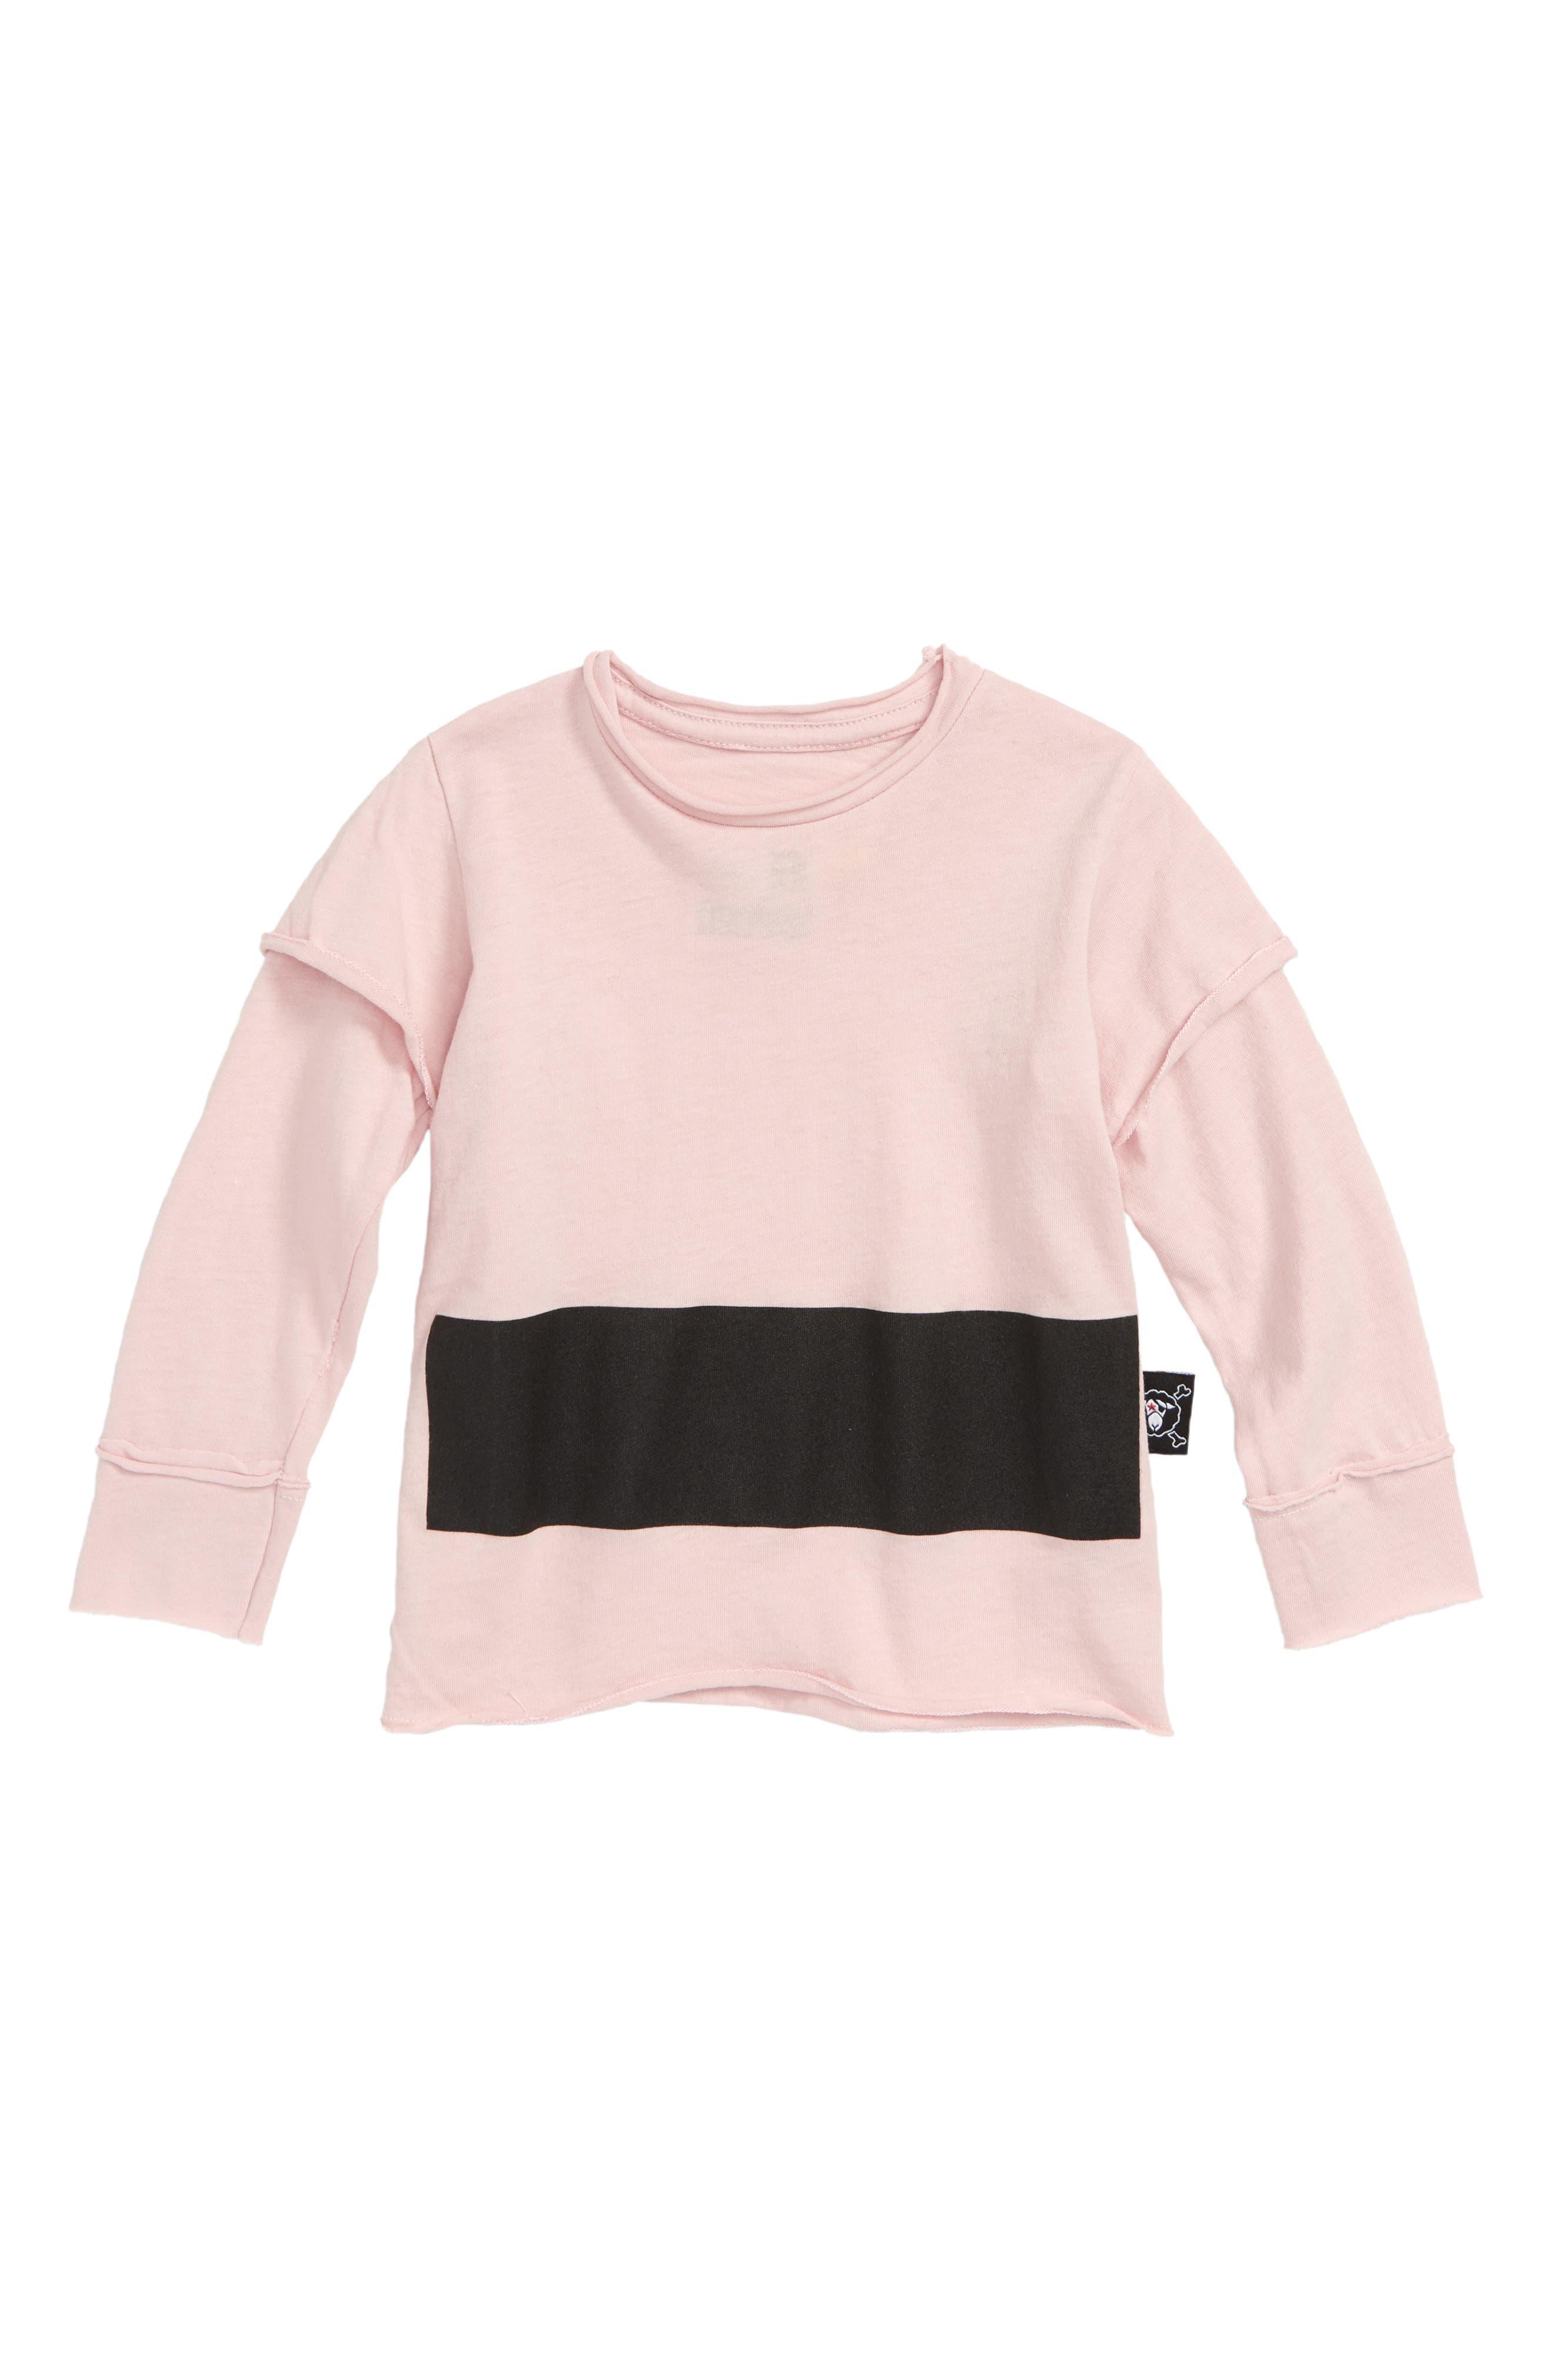 Stripe Tee,                         Main,                         color, Powder Pink